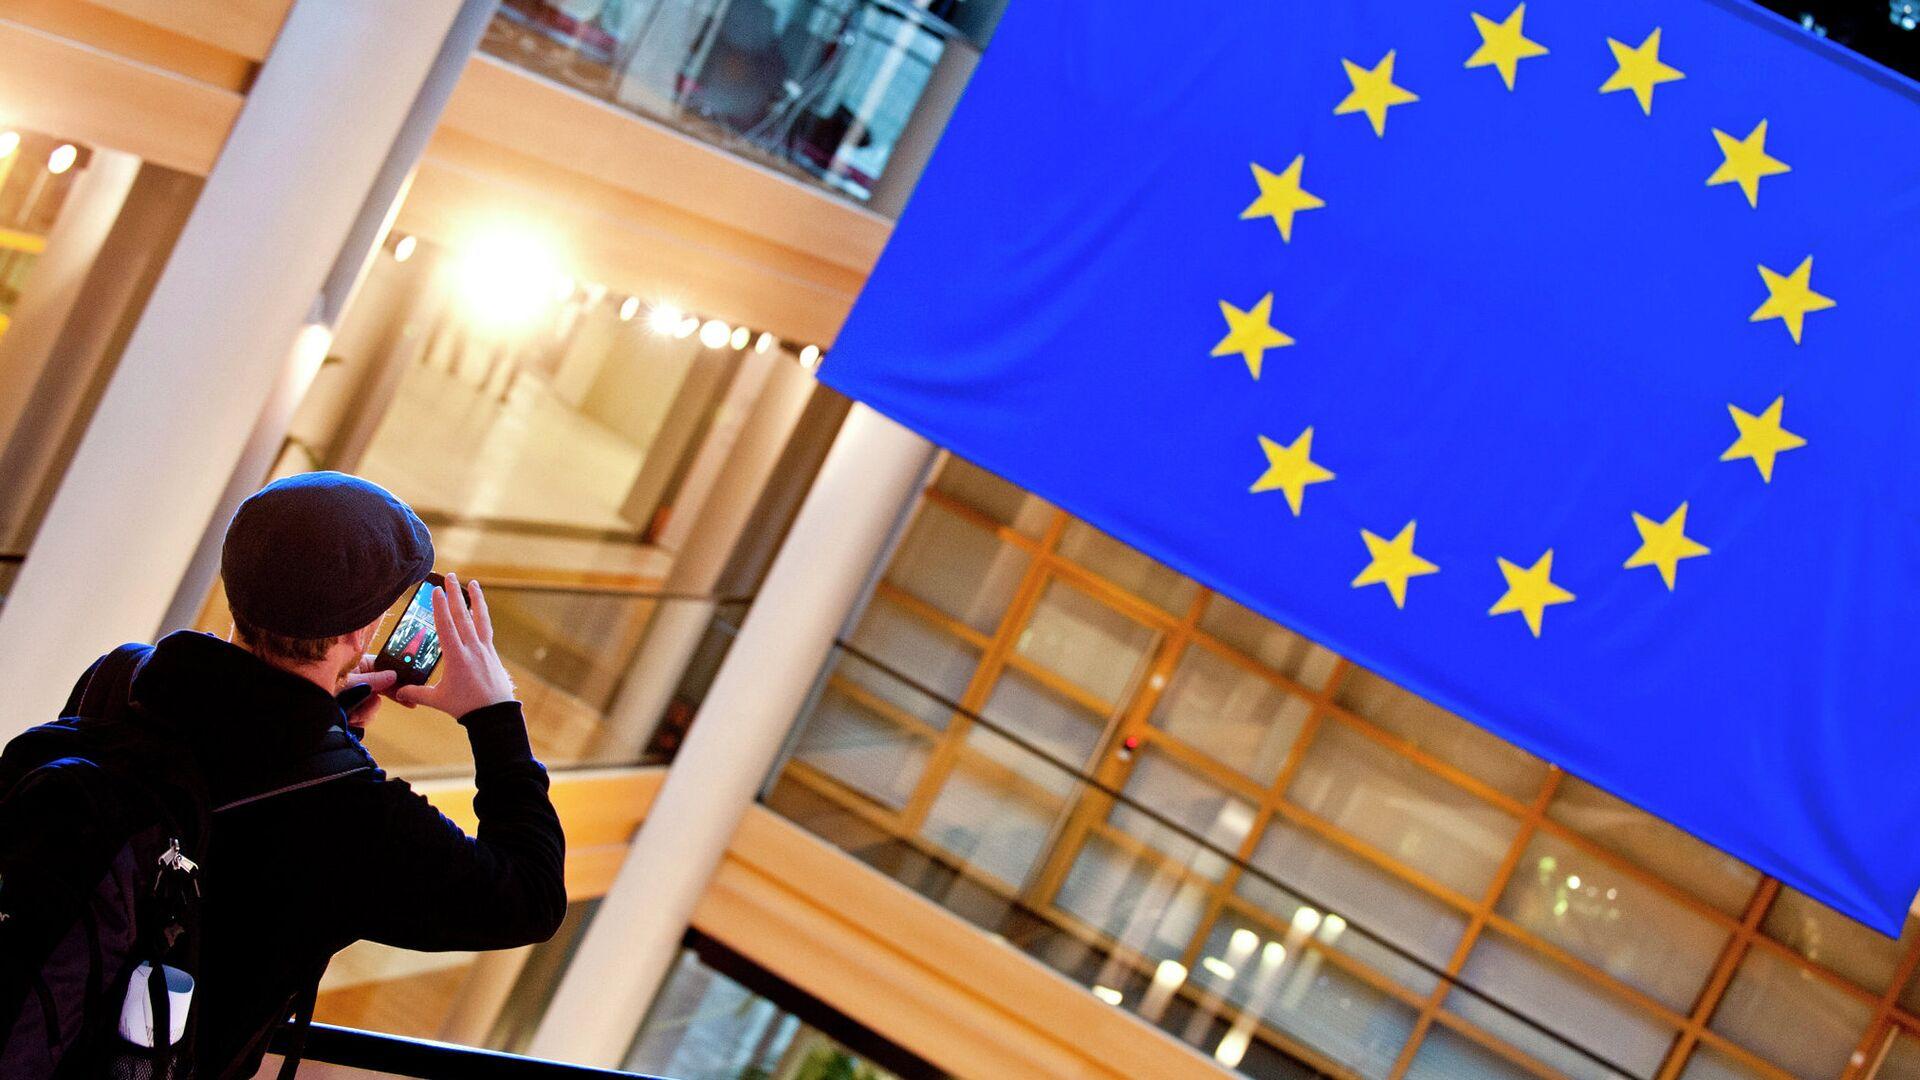 Турист фотографирует флаг Евросоюза - РИА Новости, 1920, 27.07.2015